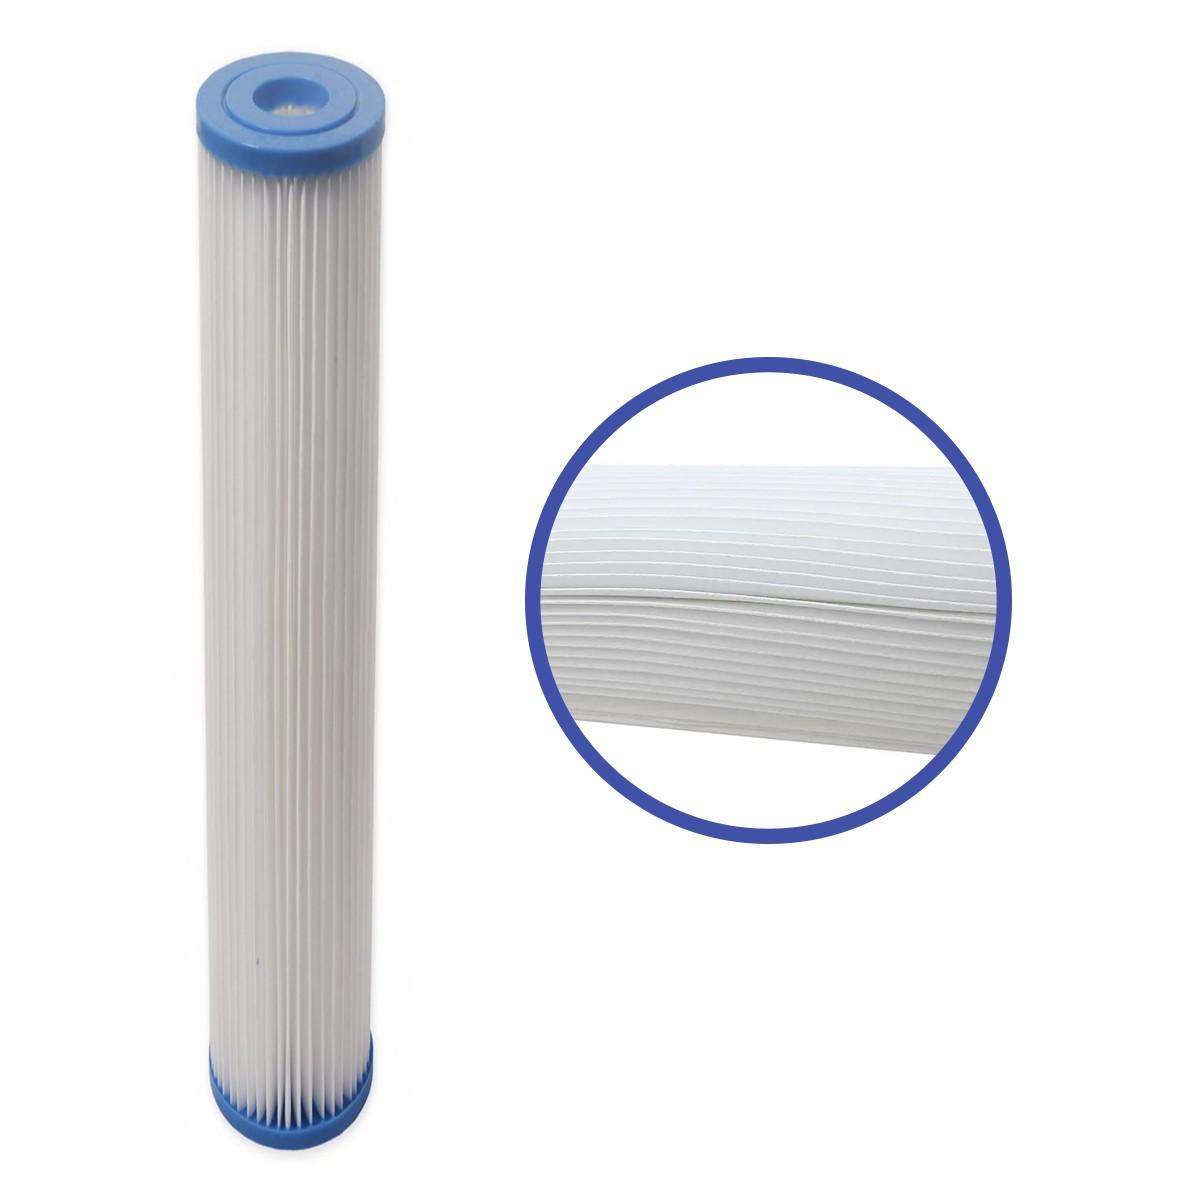 Refil Polipropileno Plissado Lavável 20 Polegadas - 1 micra